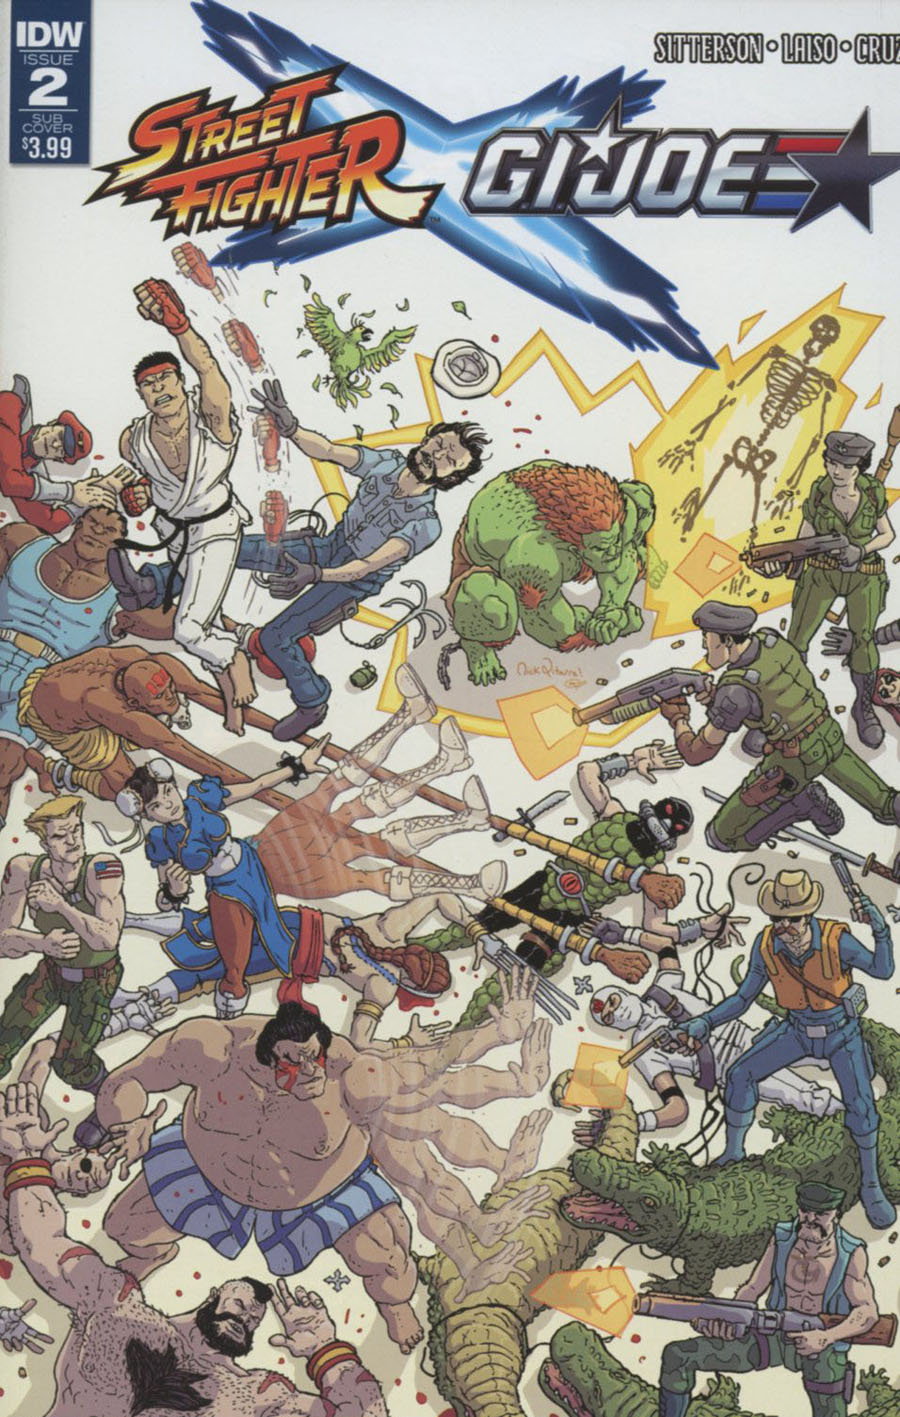 Street Fighter x GI Joe #2 Cover B Variant Nick Pitarra Subscription Cover